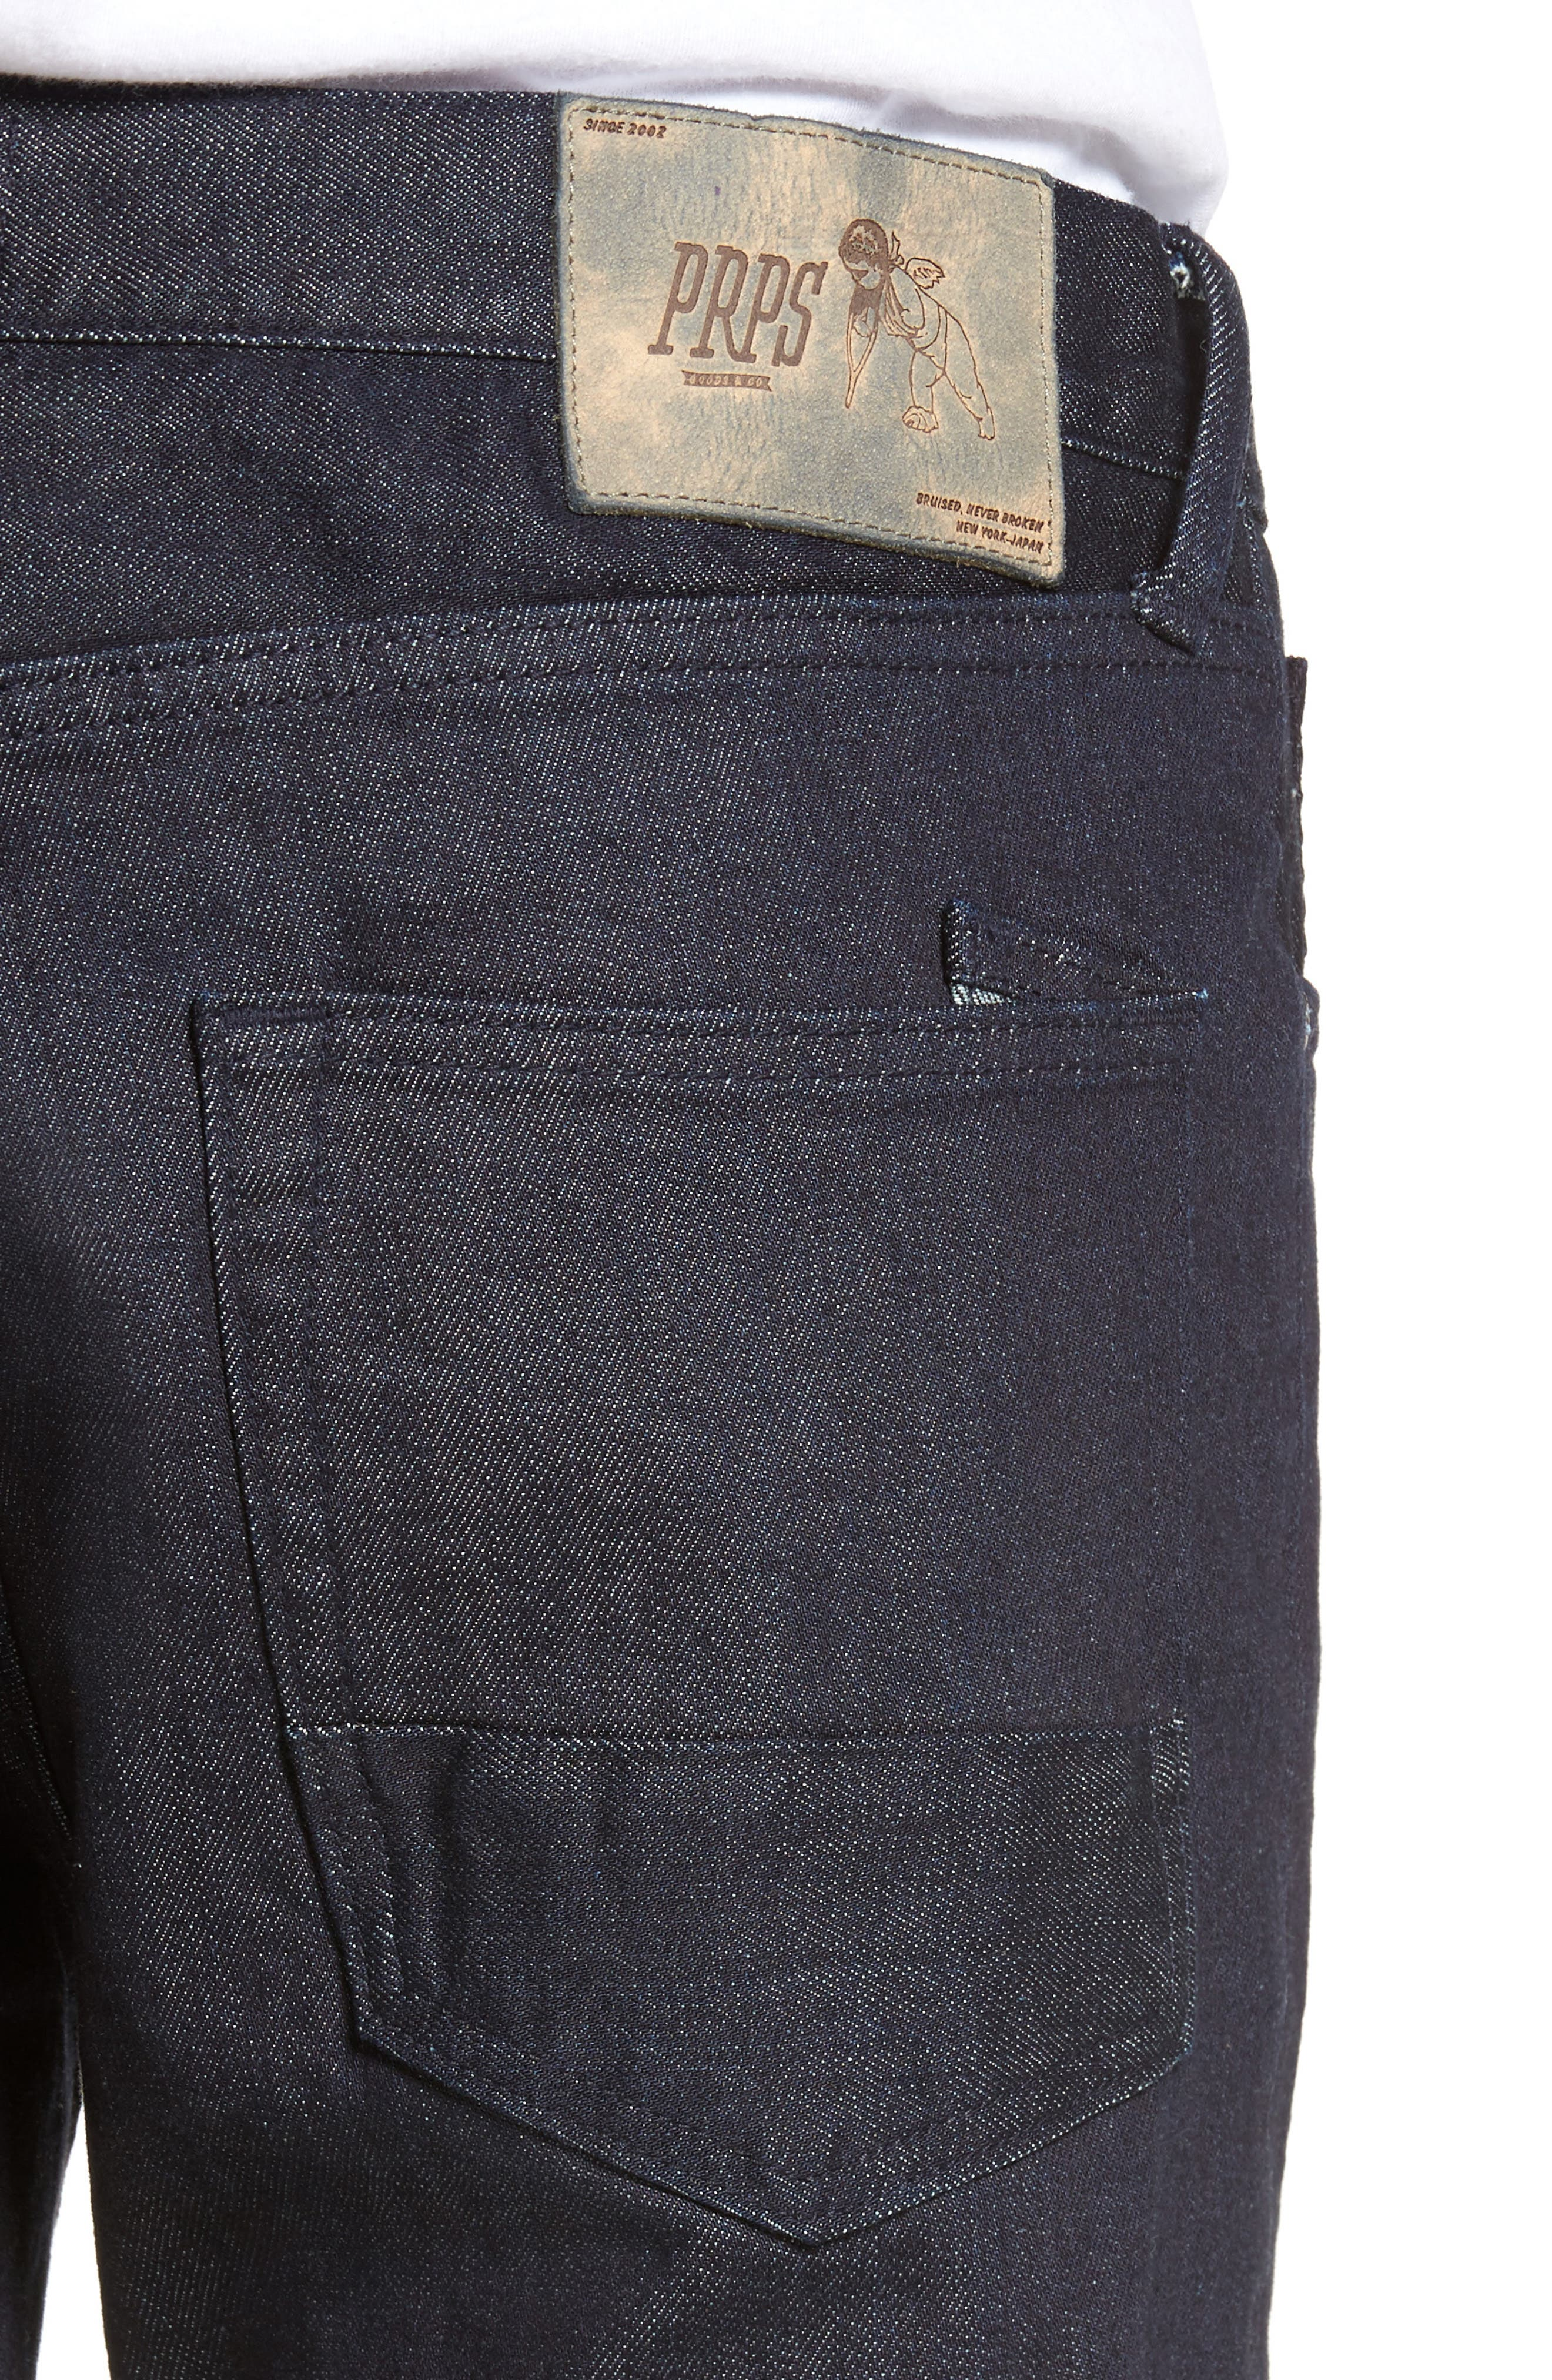 Demon Slim Straight Leg Jeans,                             Alternate thumbnail 4, color,                             Rinse